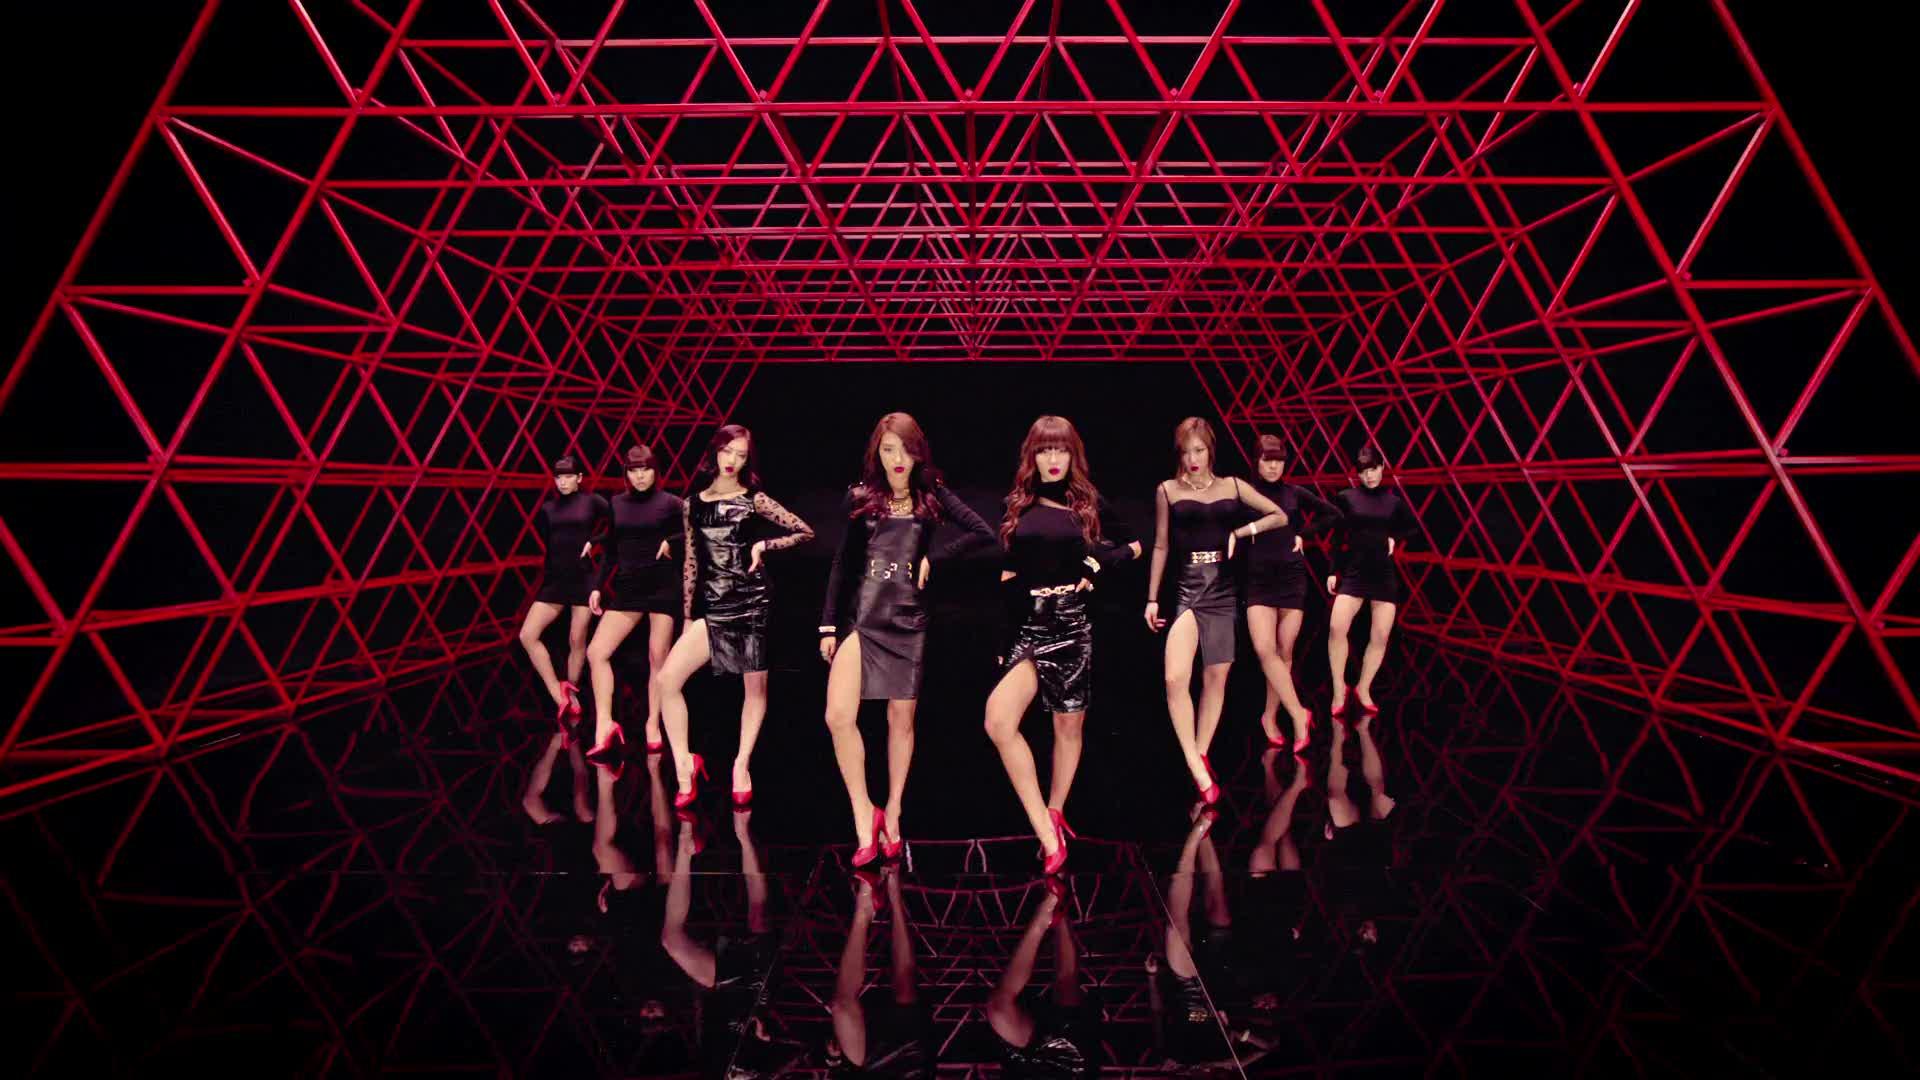 K-pop Wallpapers - Top Free K-pop Backgrounds - WallpaperAccess